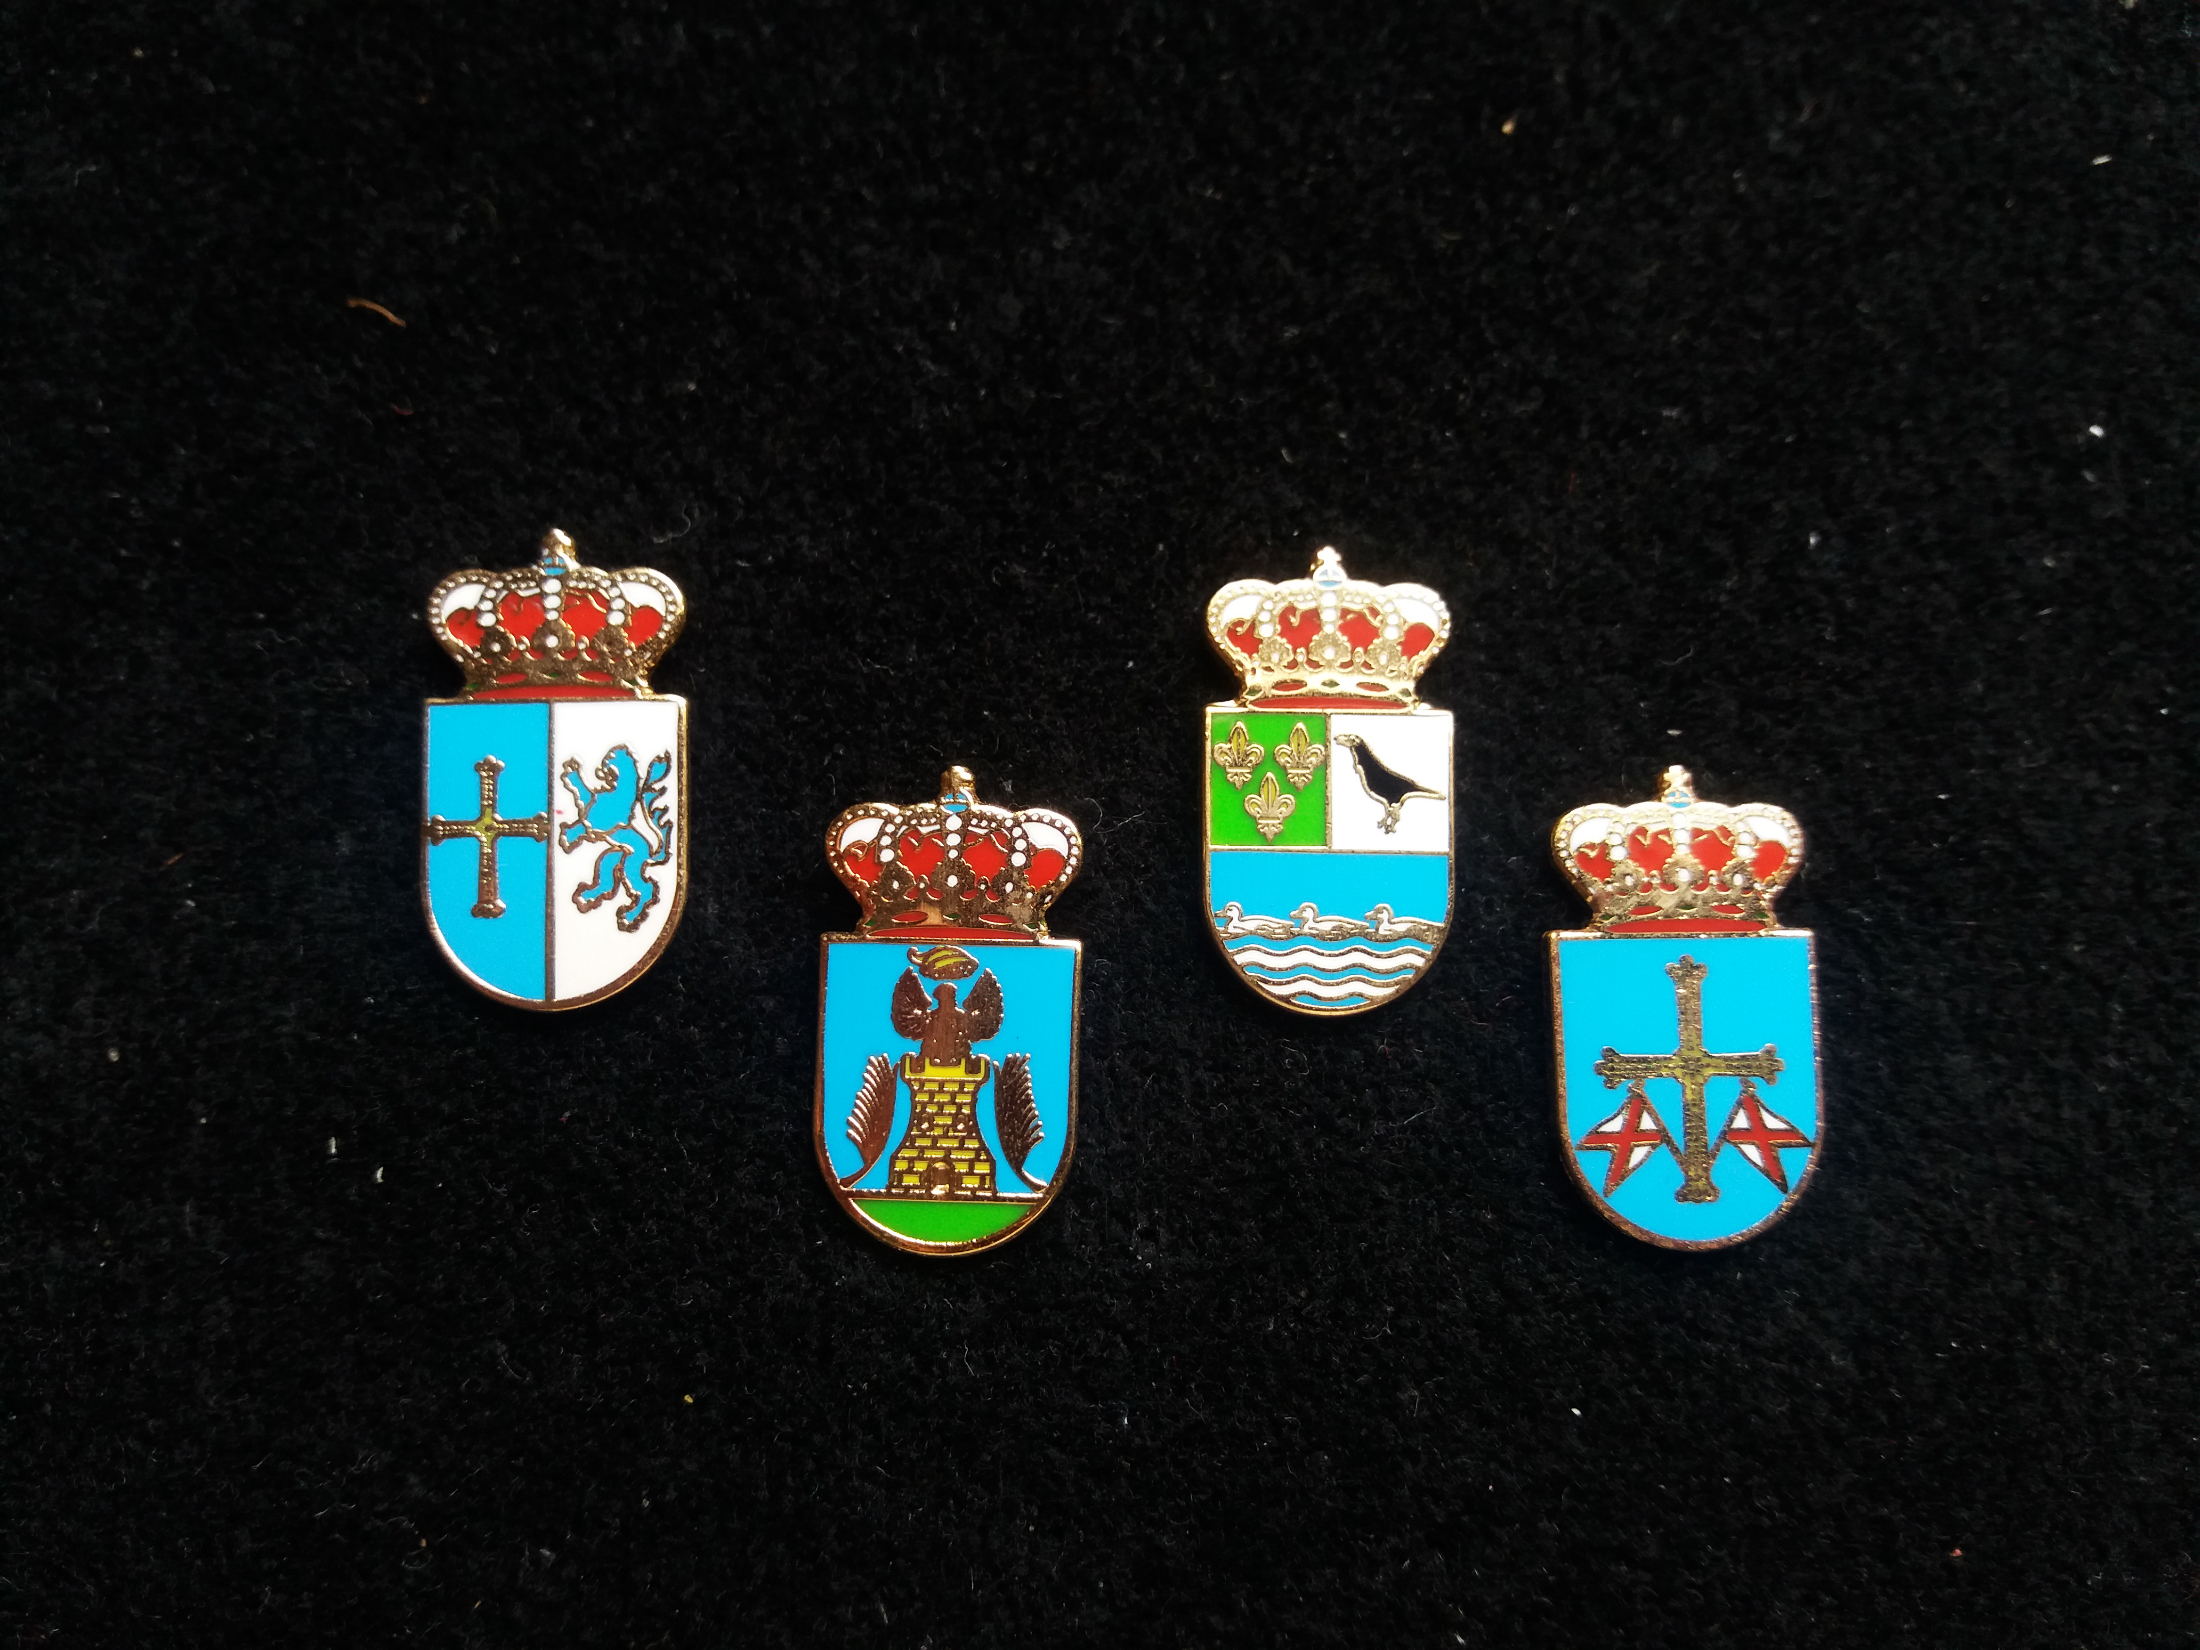 Cangas del Narcea, Castropol, Colunga and Gozón heraldic pins